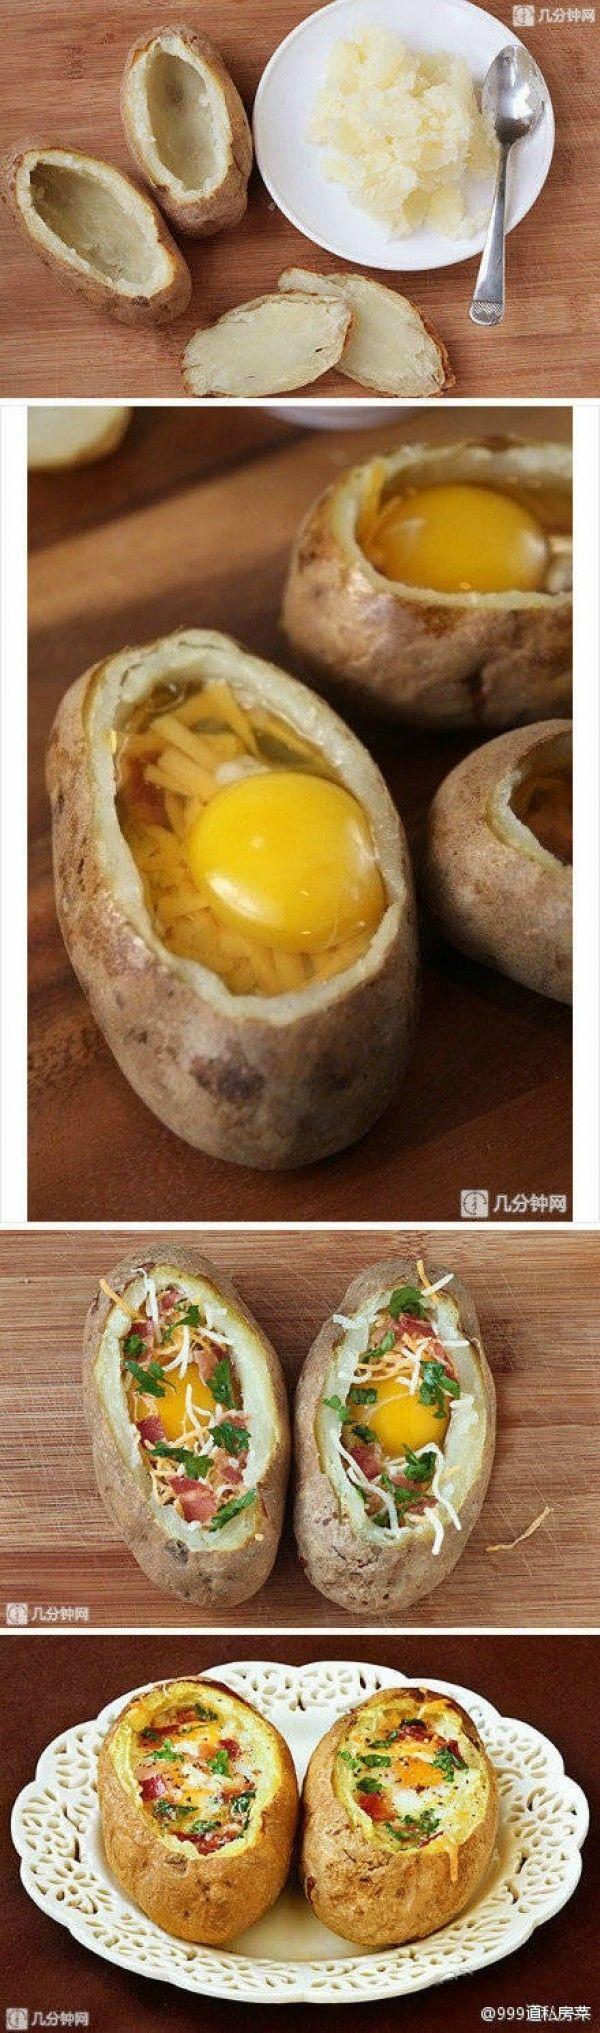 Get the recipe ♥ Idaho Sunrise Baked Eggs and Bacon in Potato Bowls @recipes_to_go